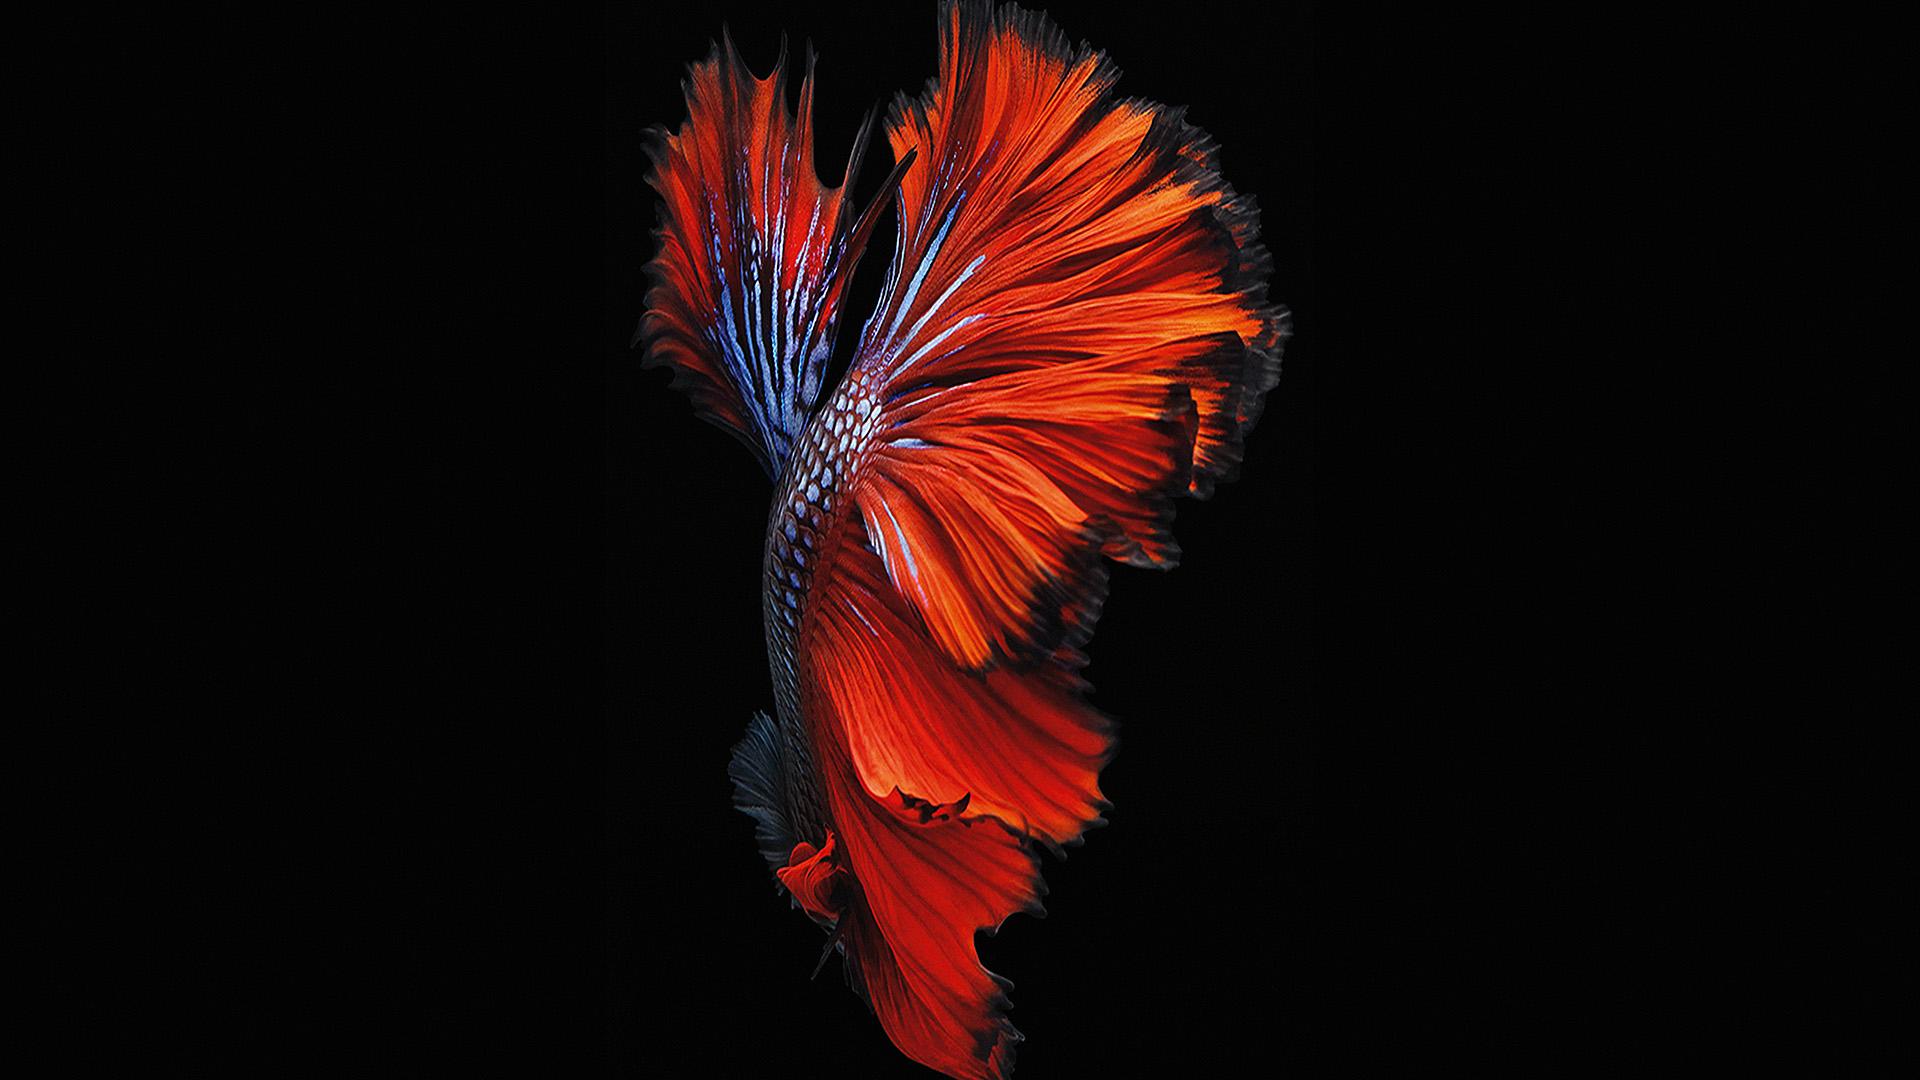 An82 Apple Ios9 Fish Live Background Dark Blue: An81-apple-ios9-fish-live-background-dark-red